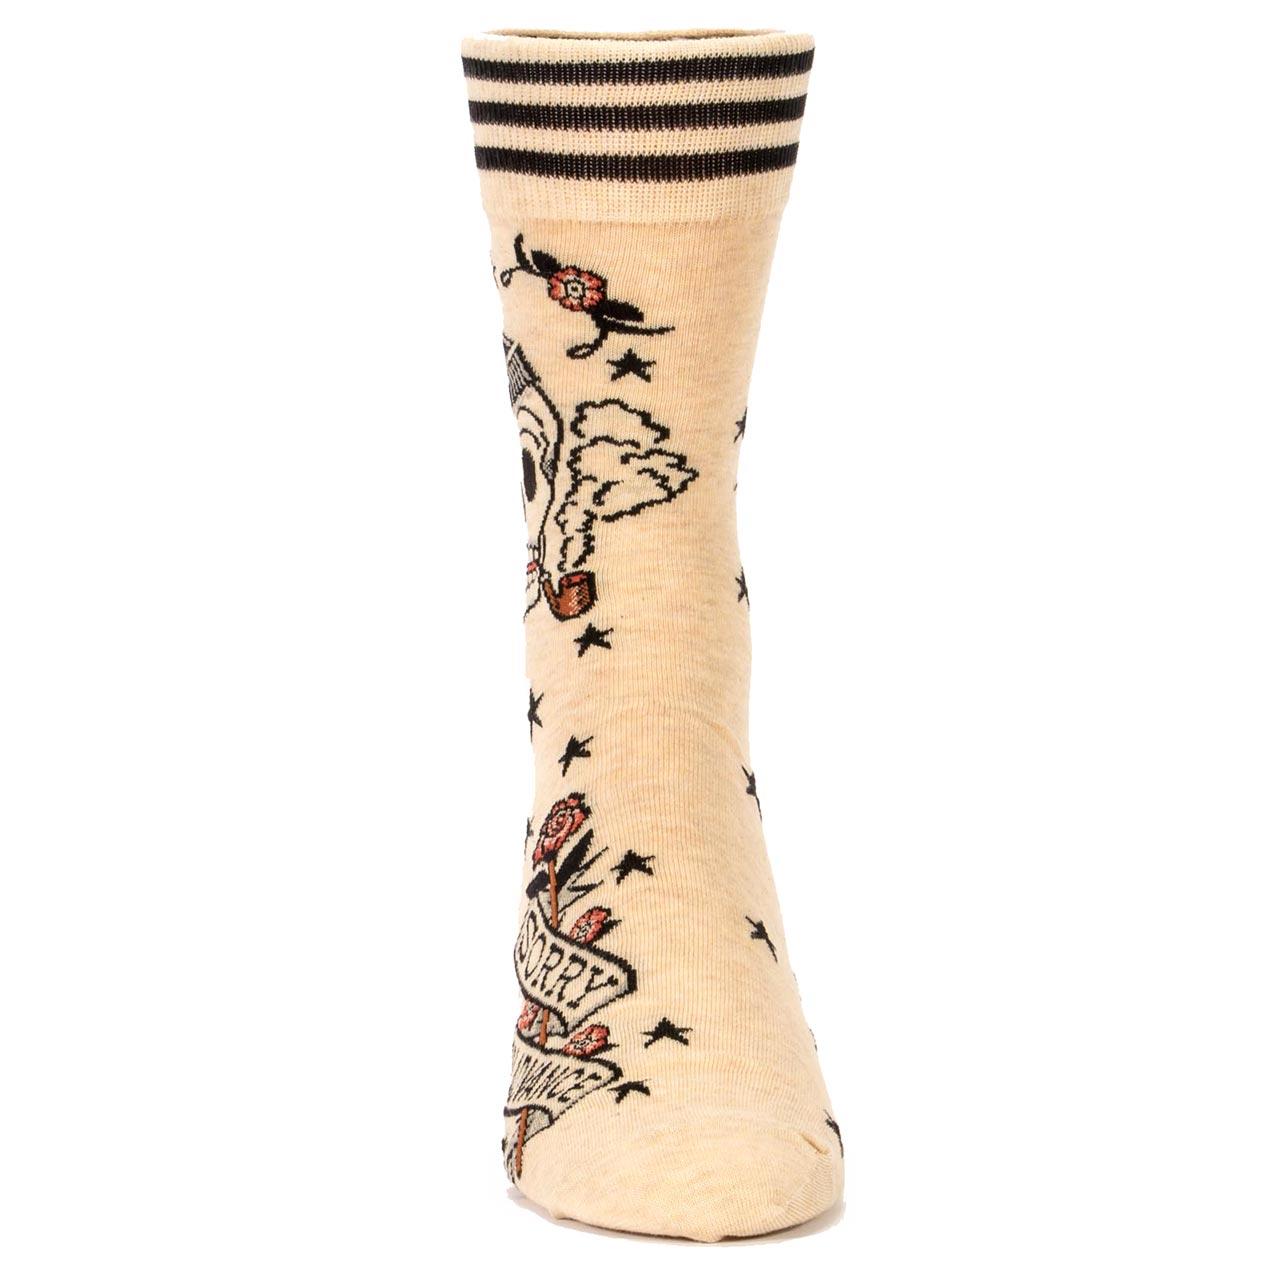 Blue Q Men's Socks 'Sorry In Advance' | the design gift shop